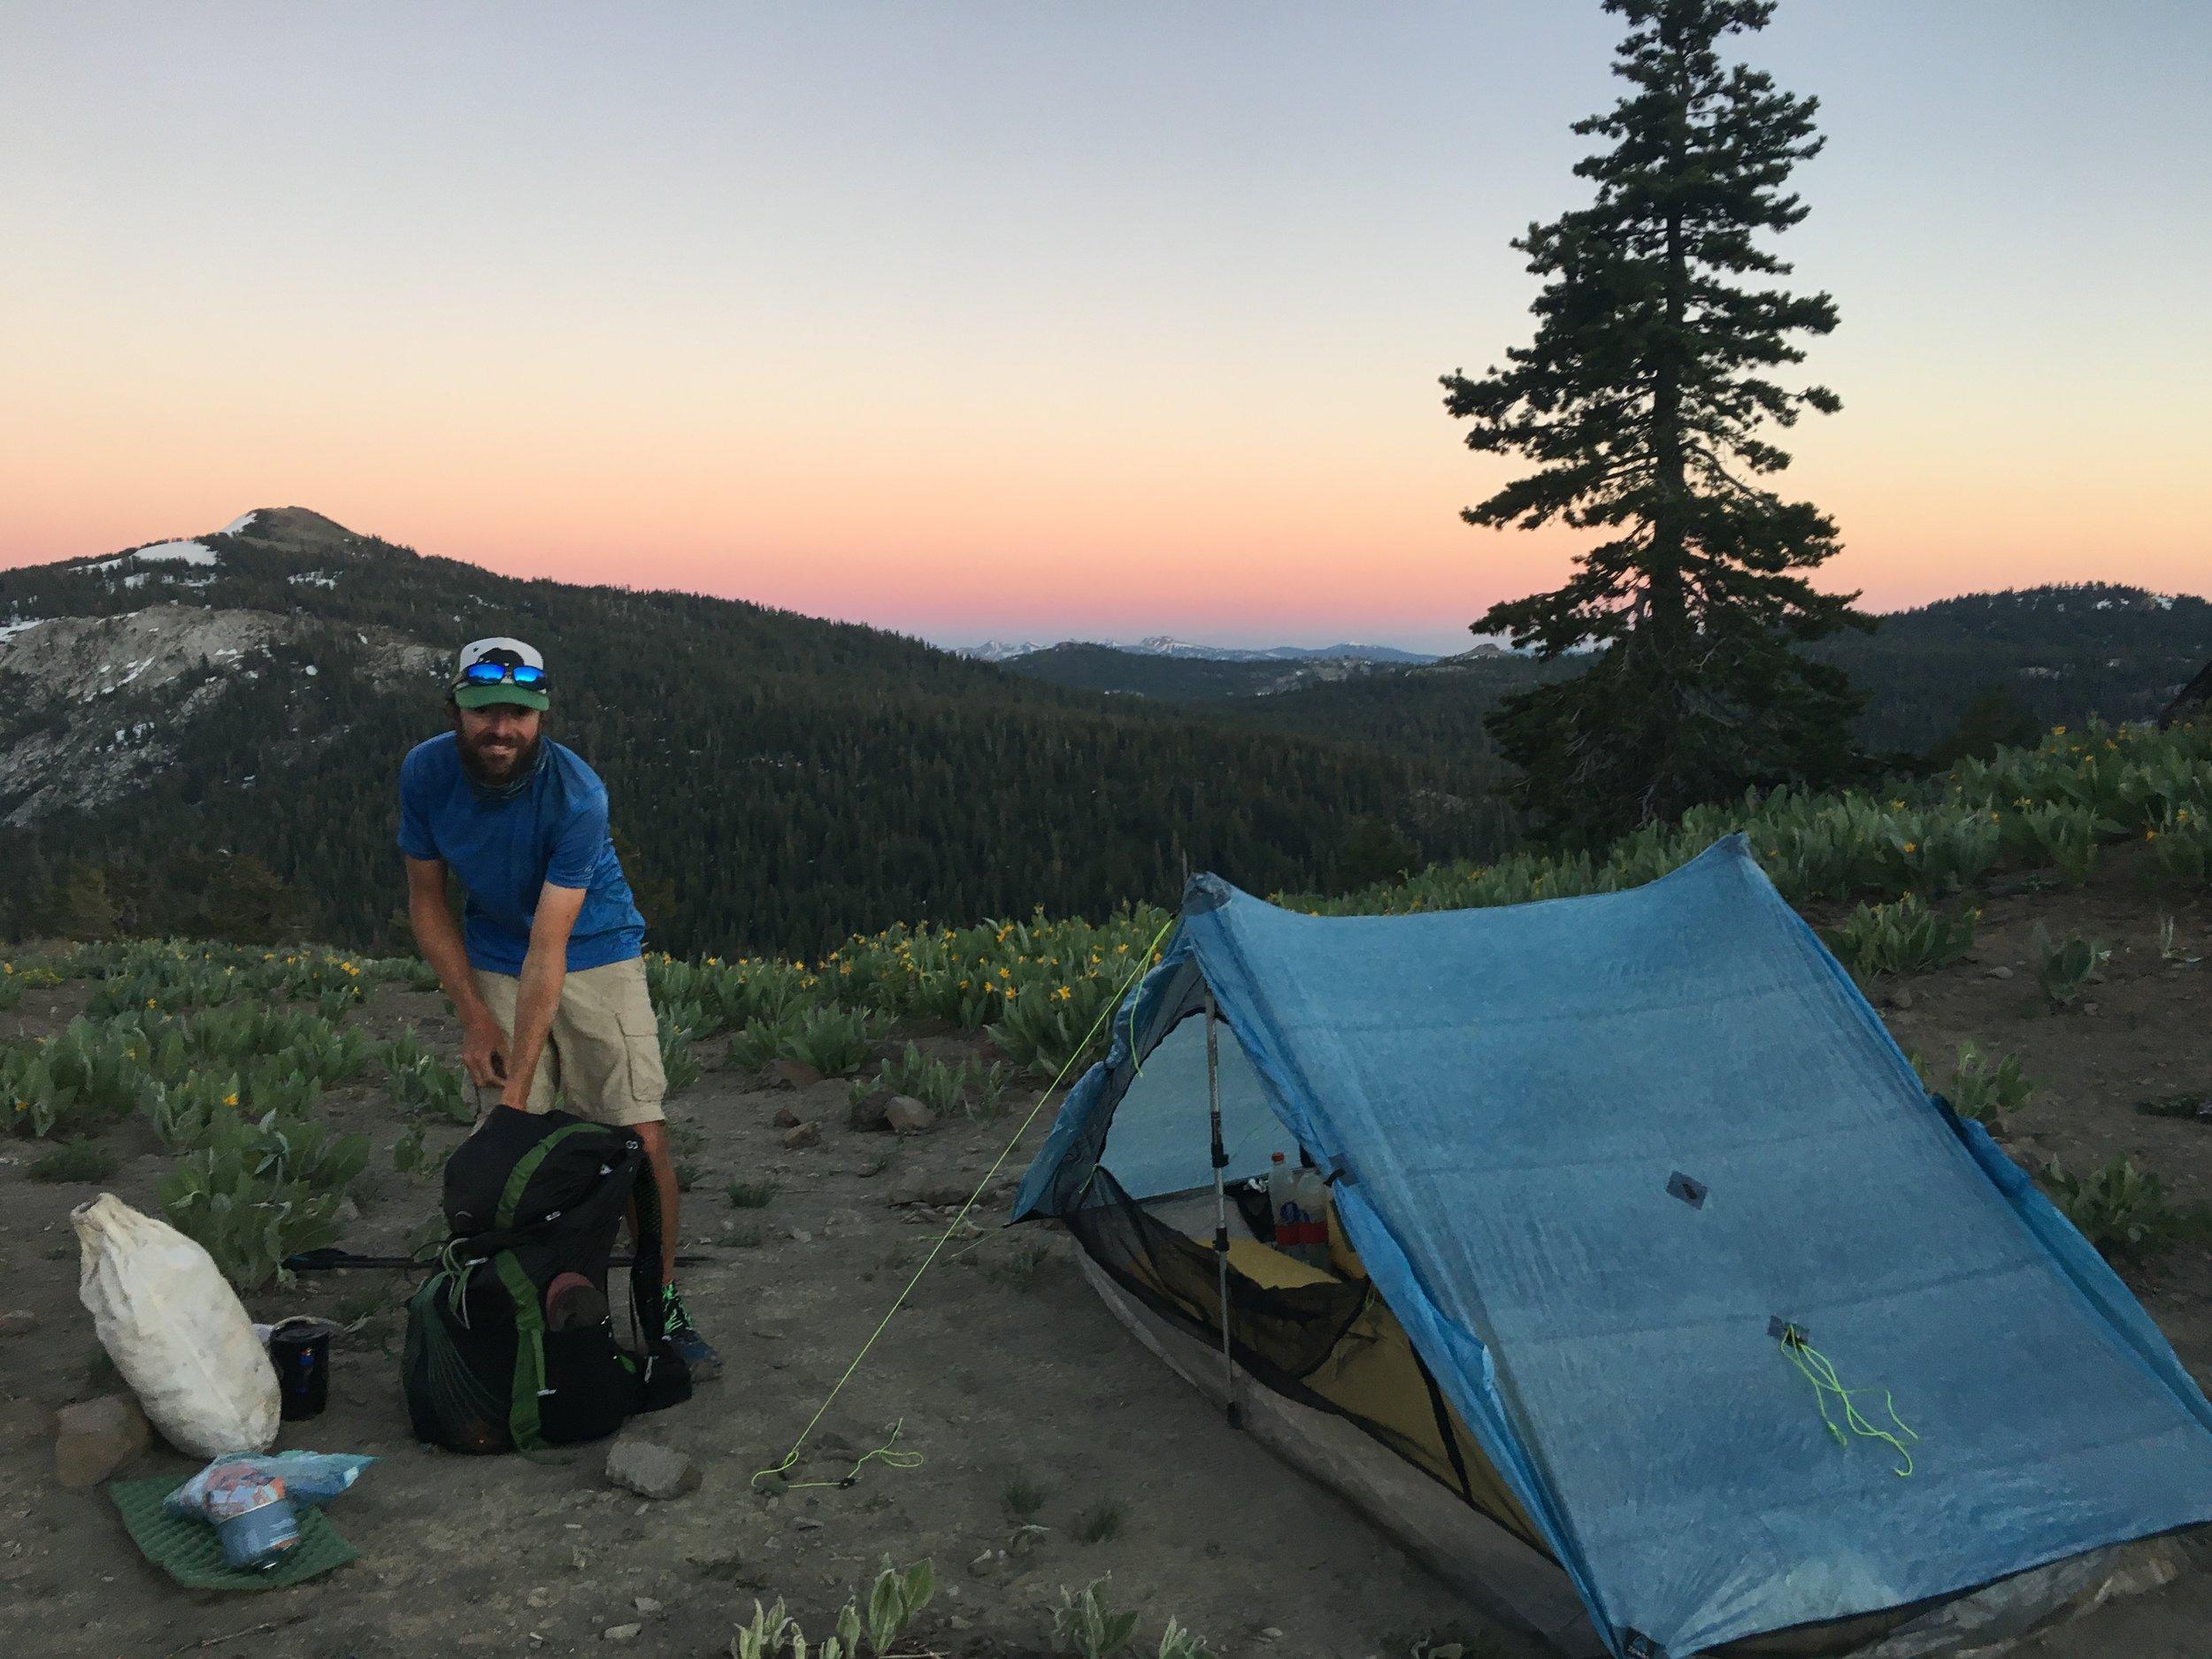 Sweet camp spot